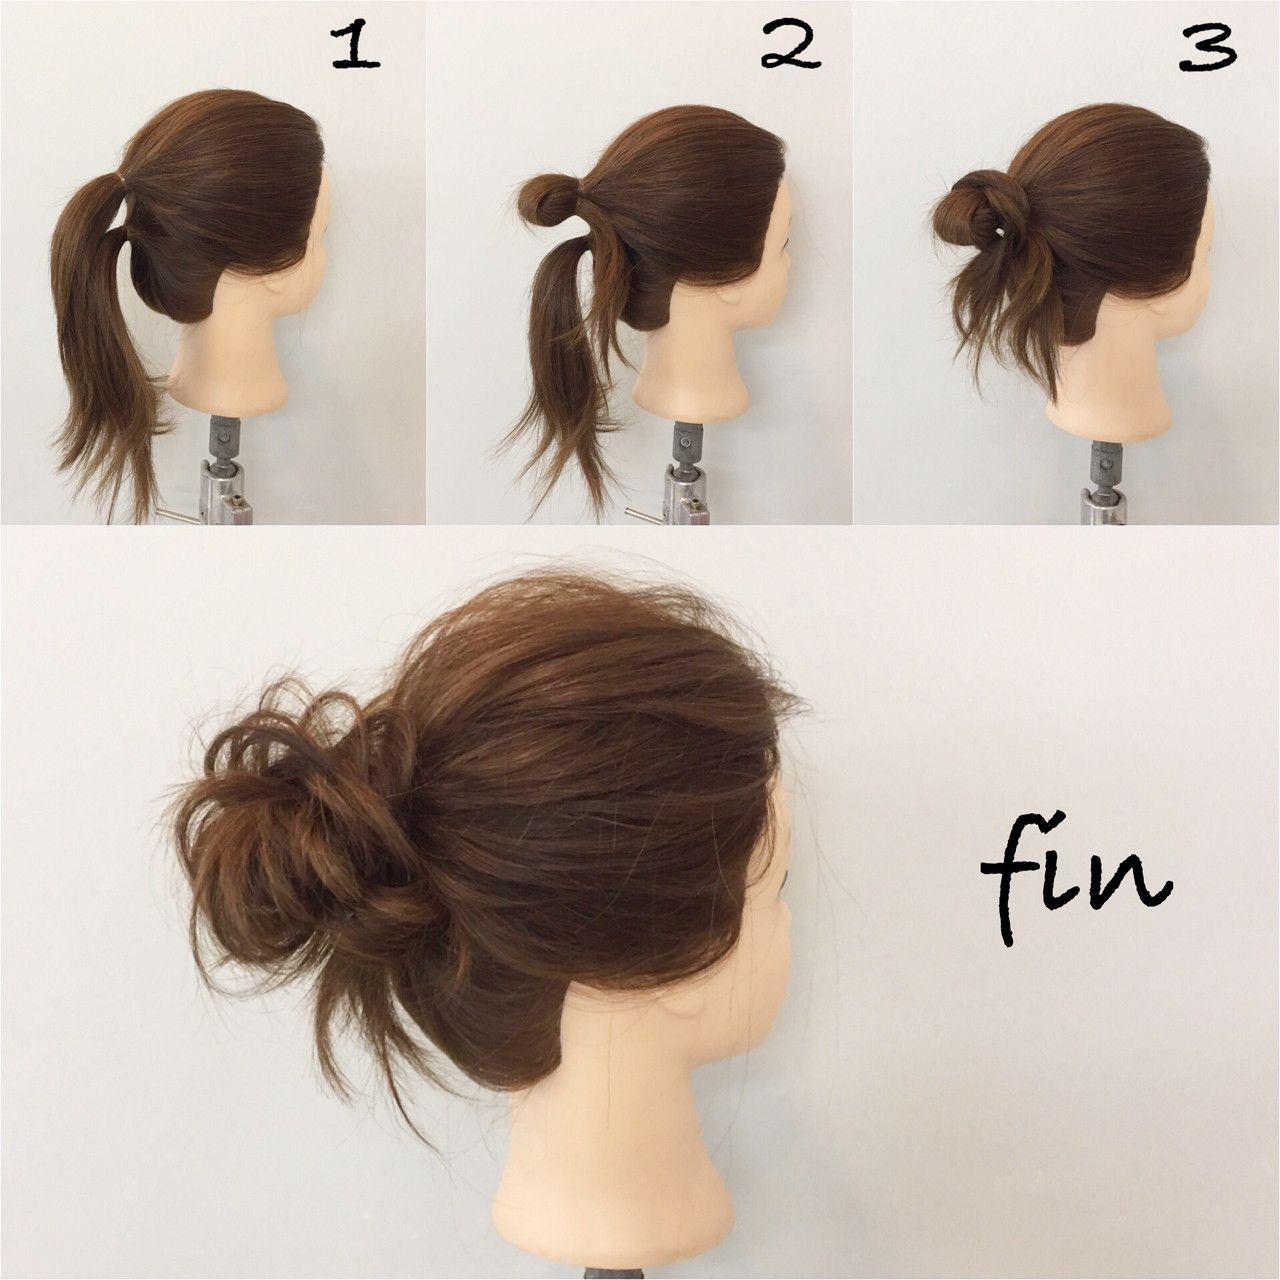 Pin by julieta cuello on peinados pinterest easy bun easy and